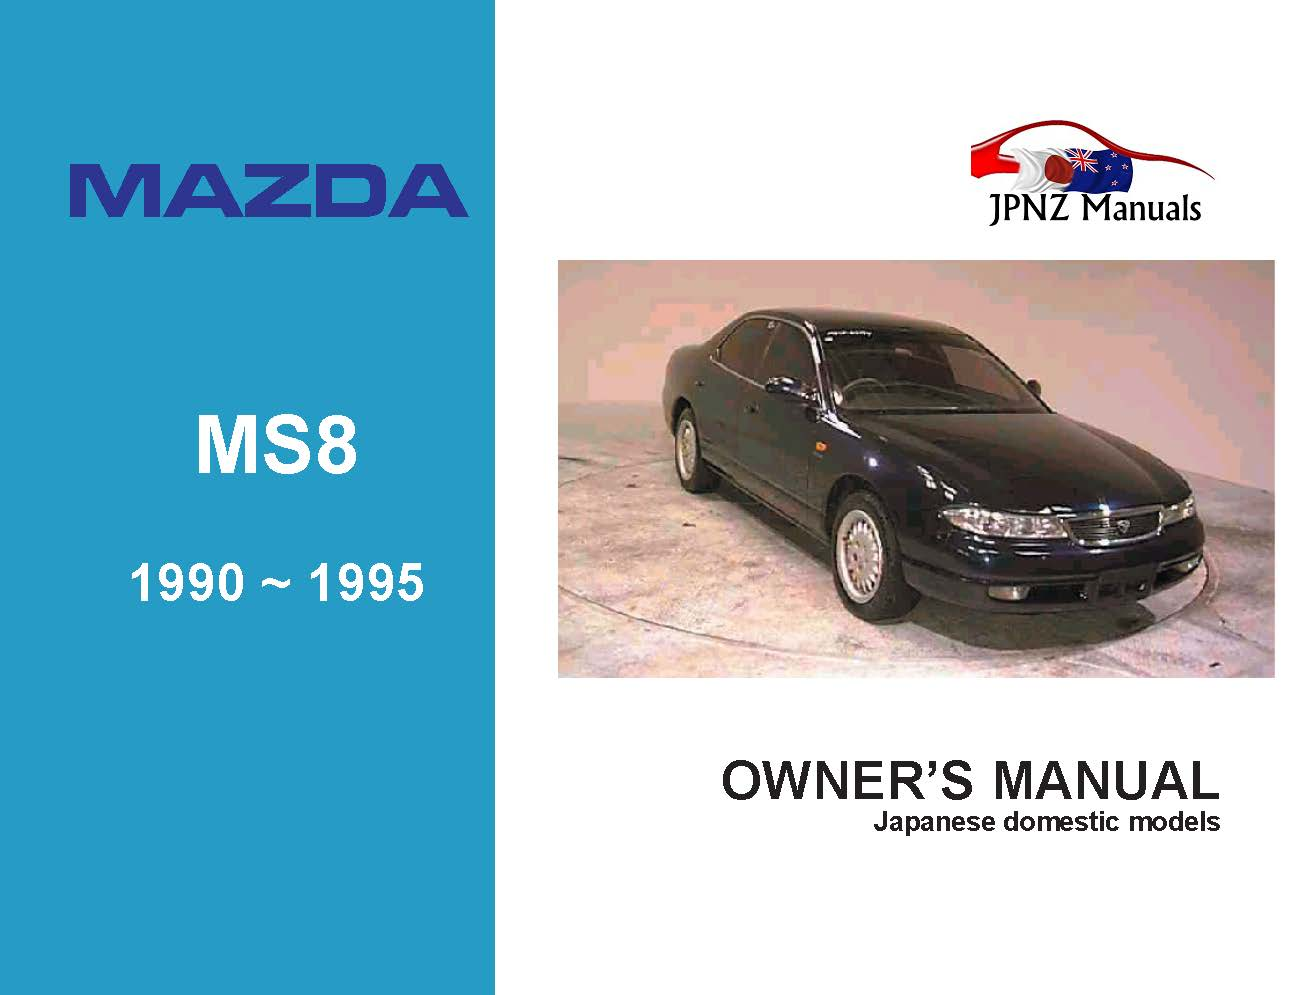 Mazda - MS8 Owners User Manual In English | 1990 - 1995